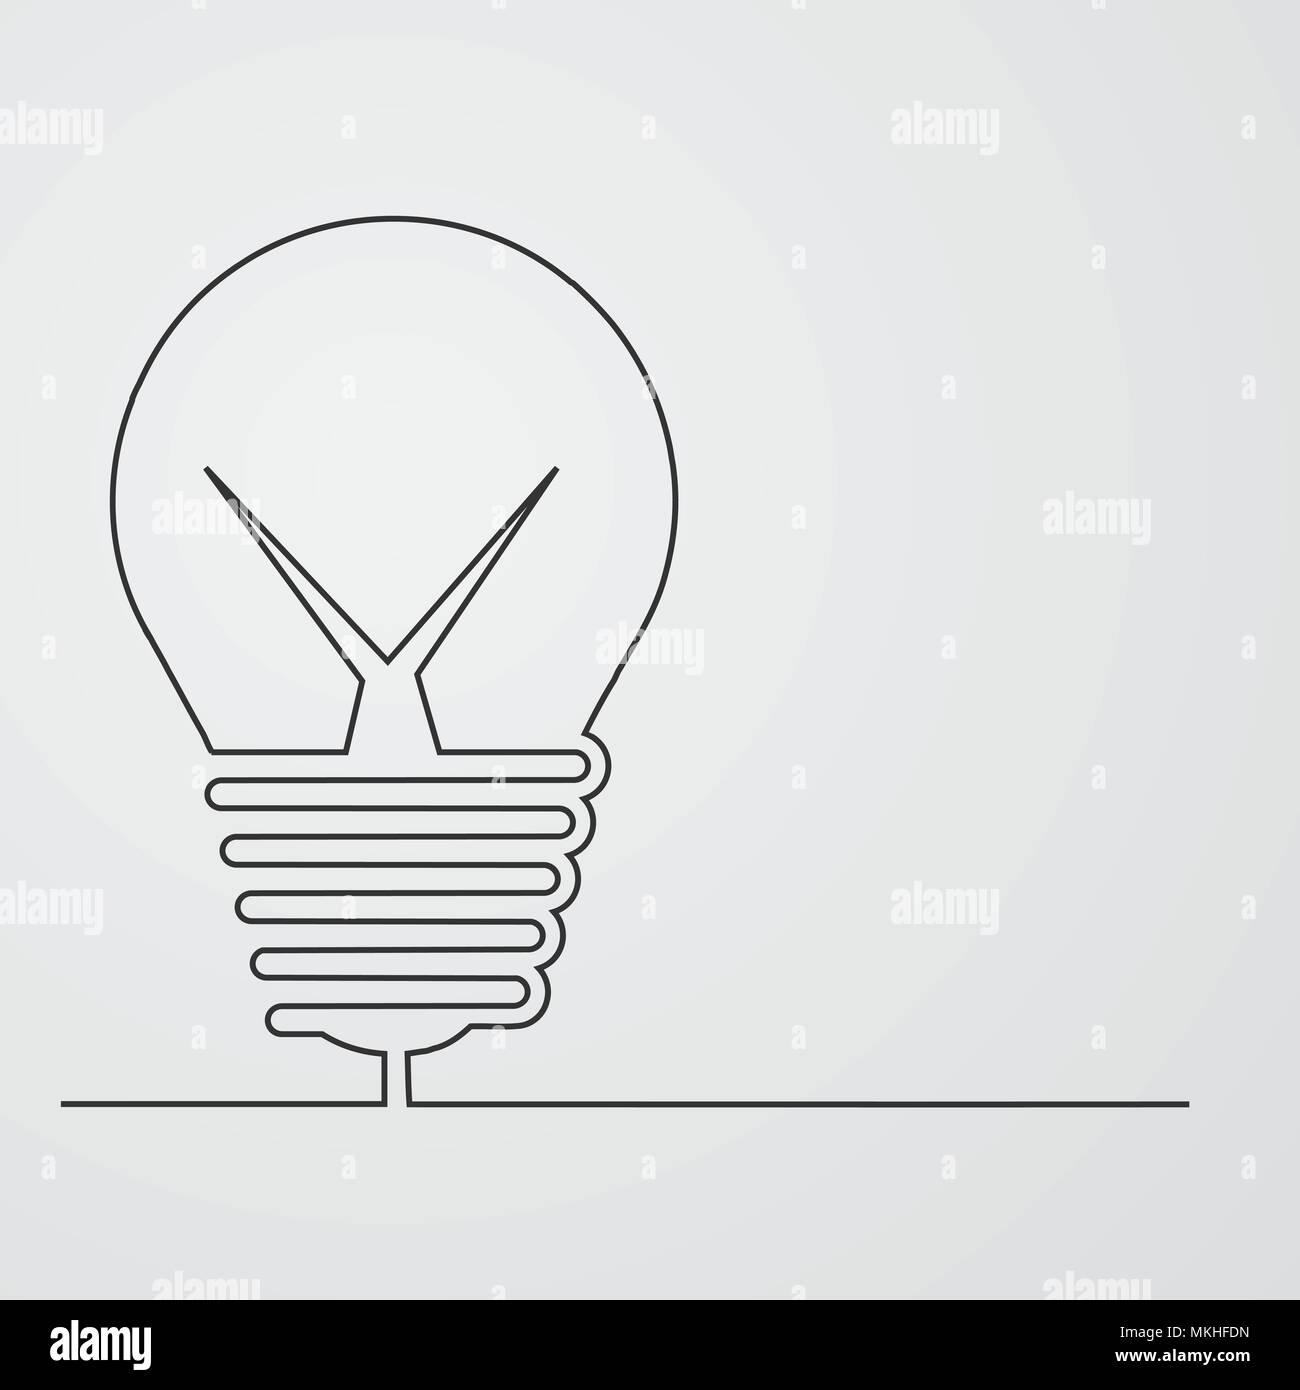 Light Bulb Logo Stock Photos & Light Bulb Logo Stock ...